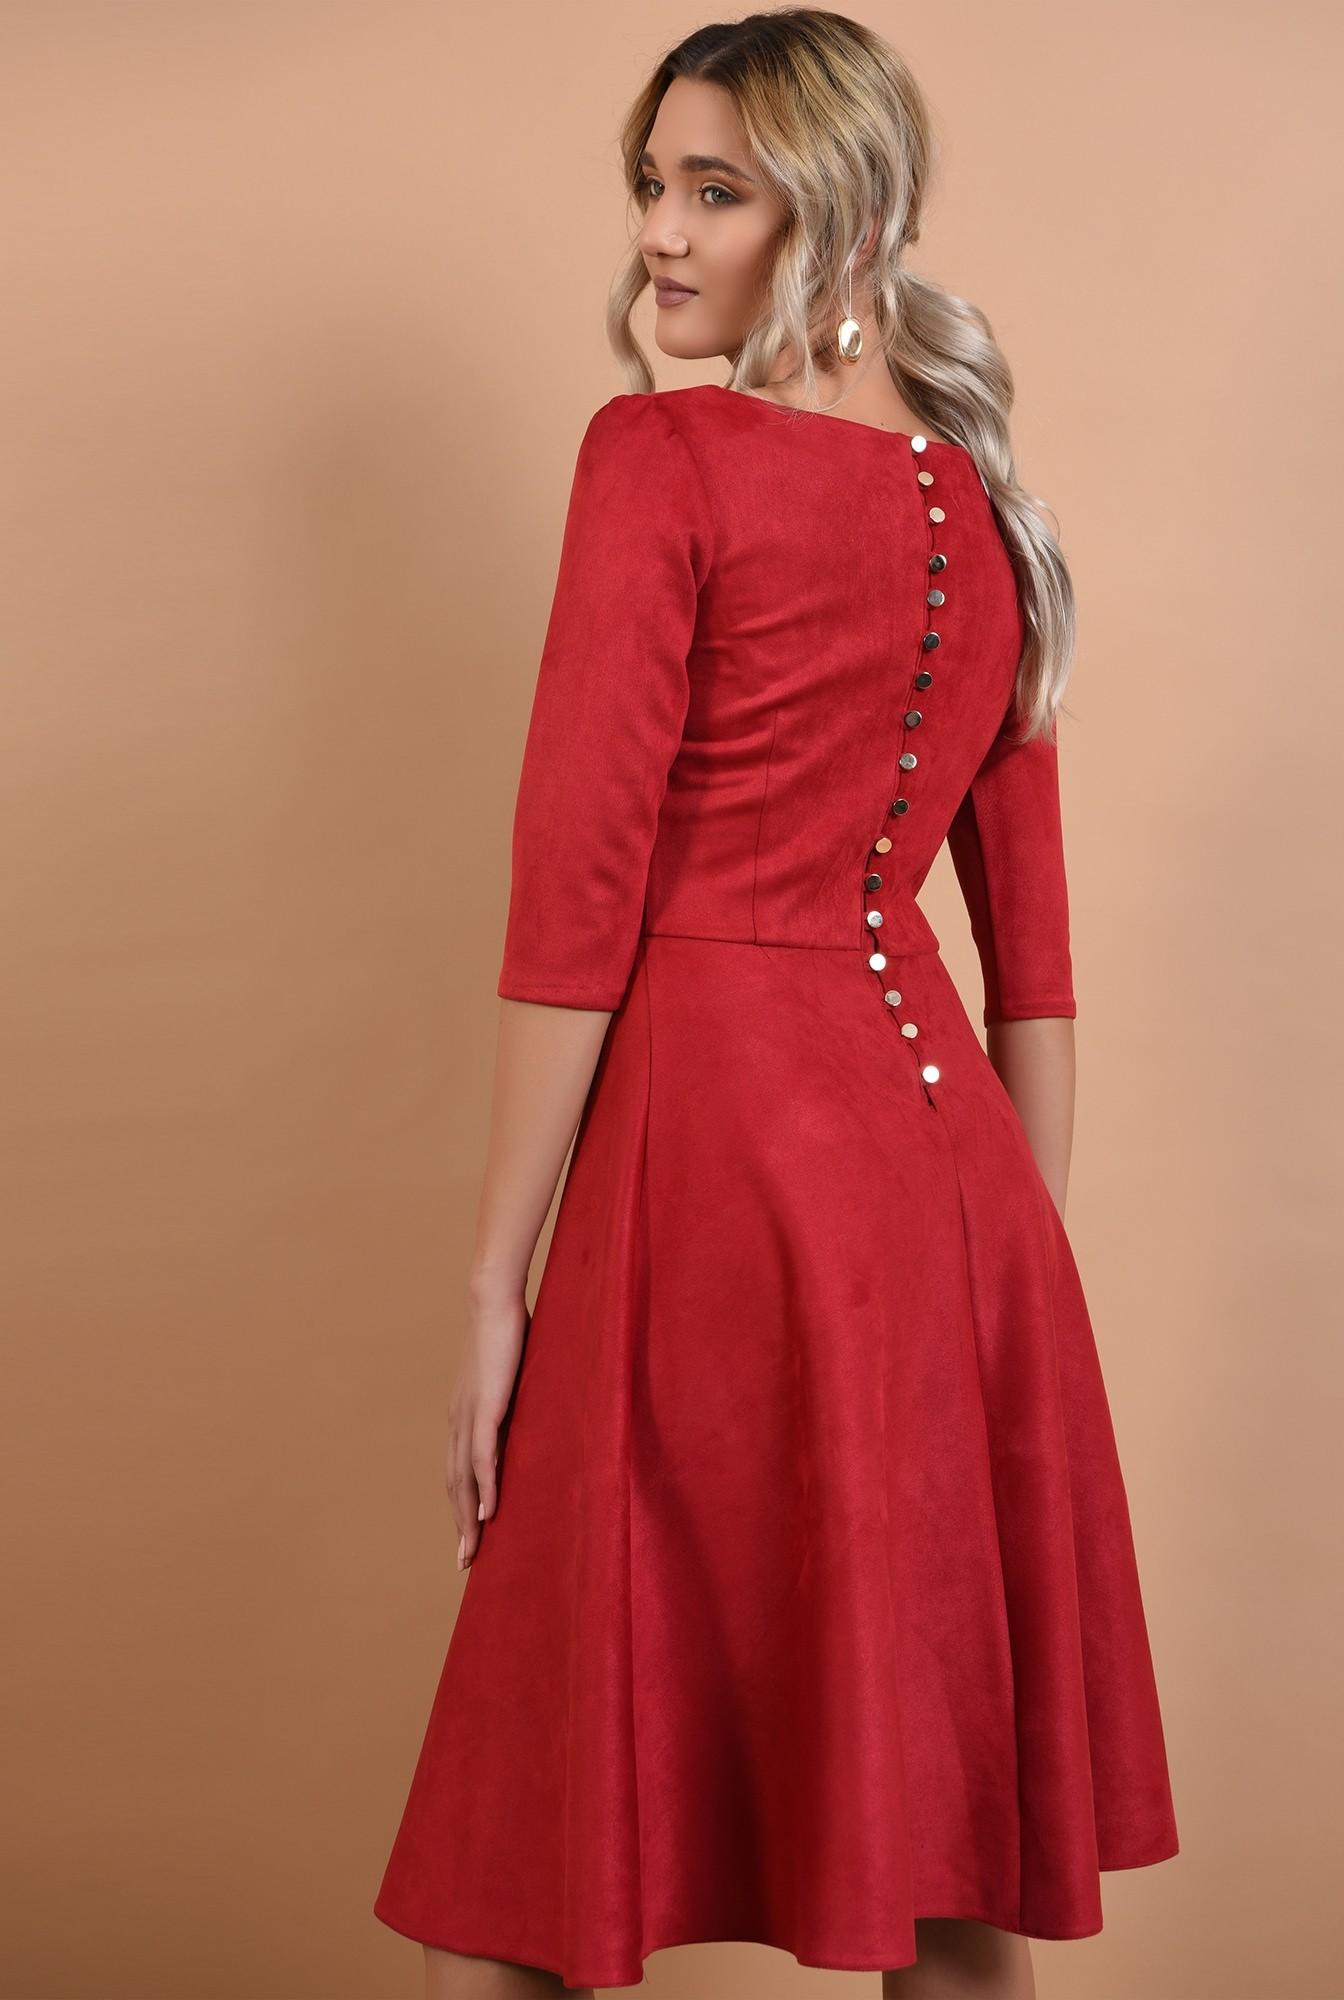 rochie rosie, din piele intoarsa, maneci midi, nasturi aurii la spate, Poema